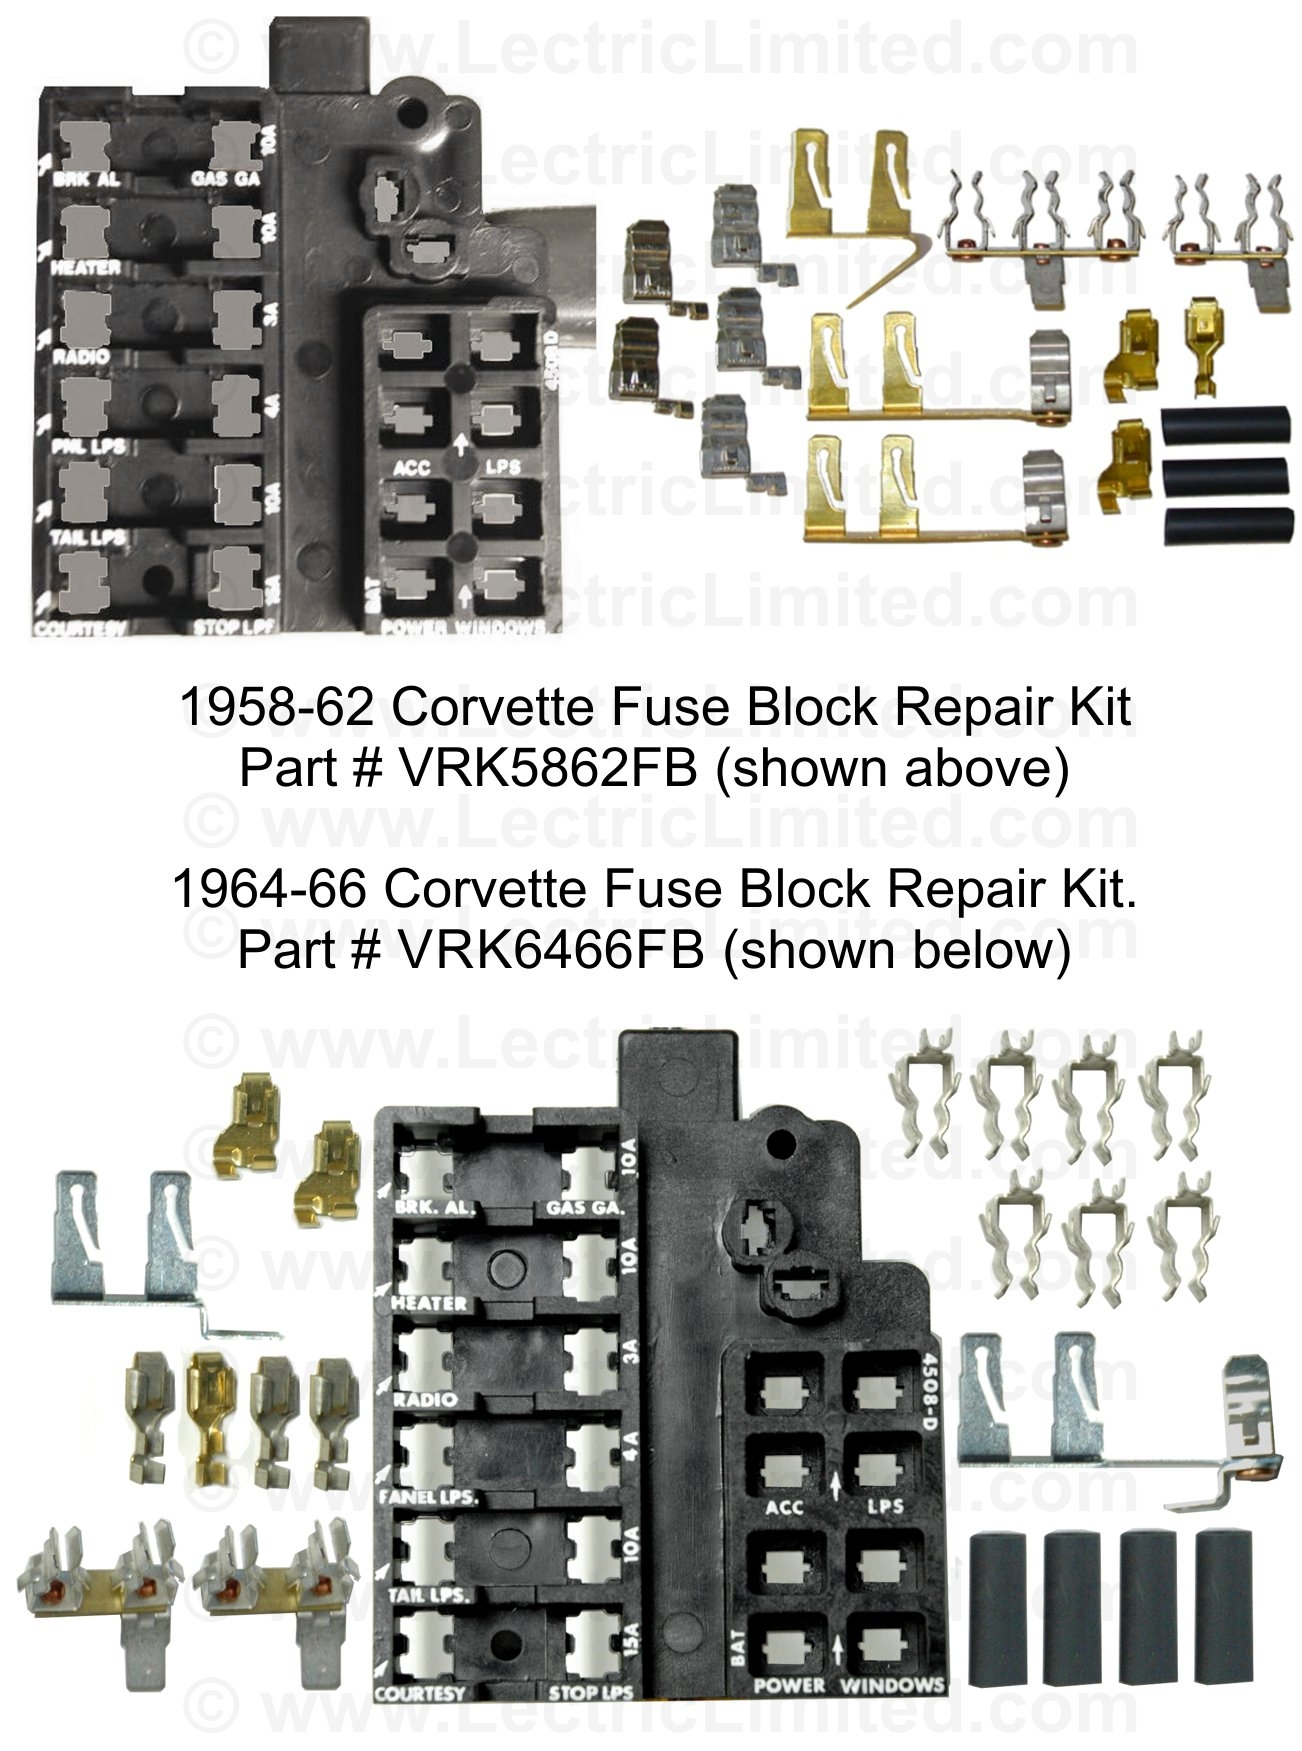 [WLLP_2054]   5915A 1966 Impala Fuse Box Diagram | Wiring Diagram | Wiring Library | 1966 Chevy Fuse Box |  | Wiring Library